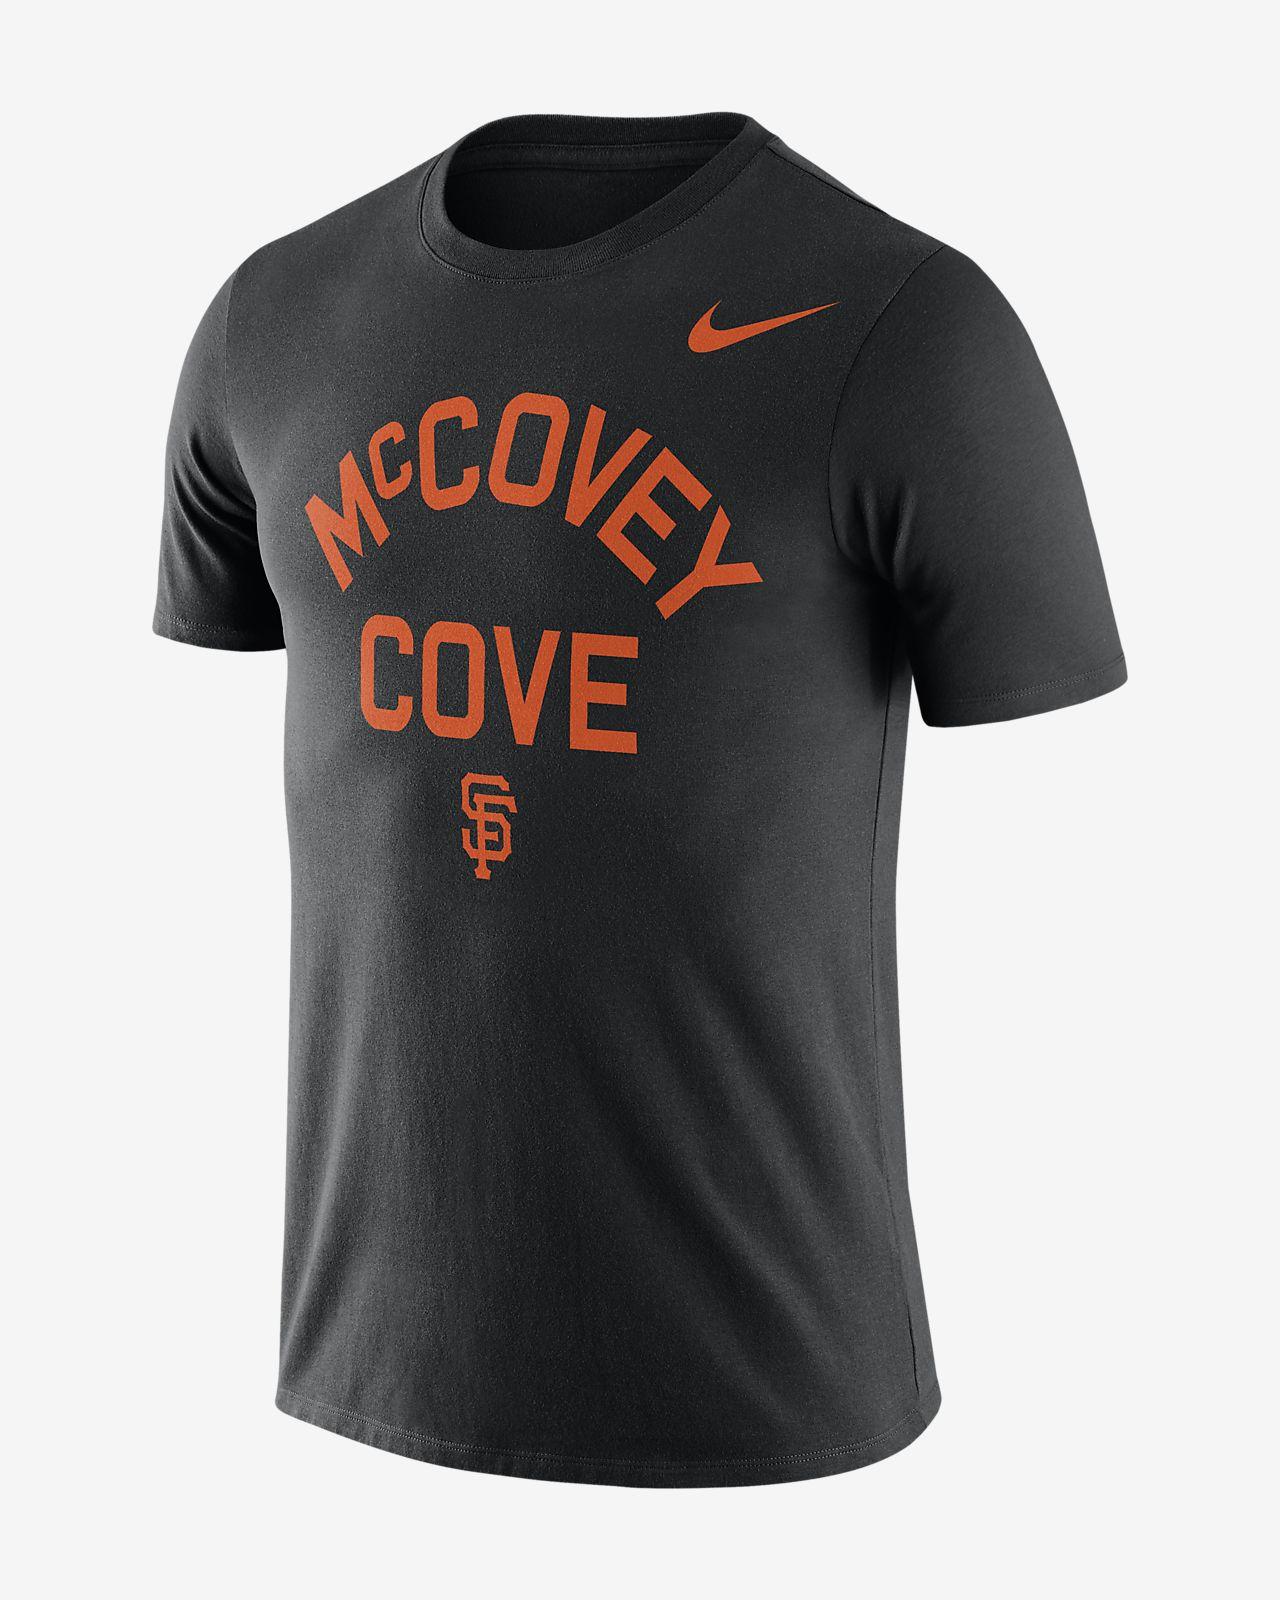 Nike Local Phrase (MLB Giants) Men's T-Shirt